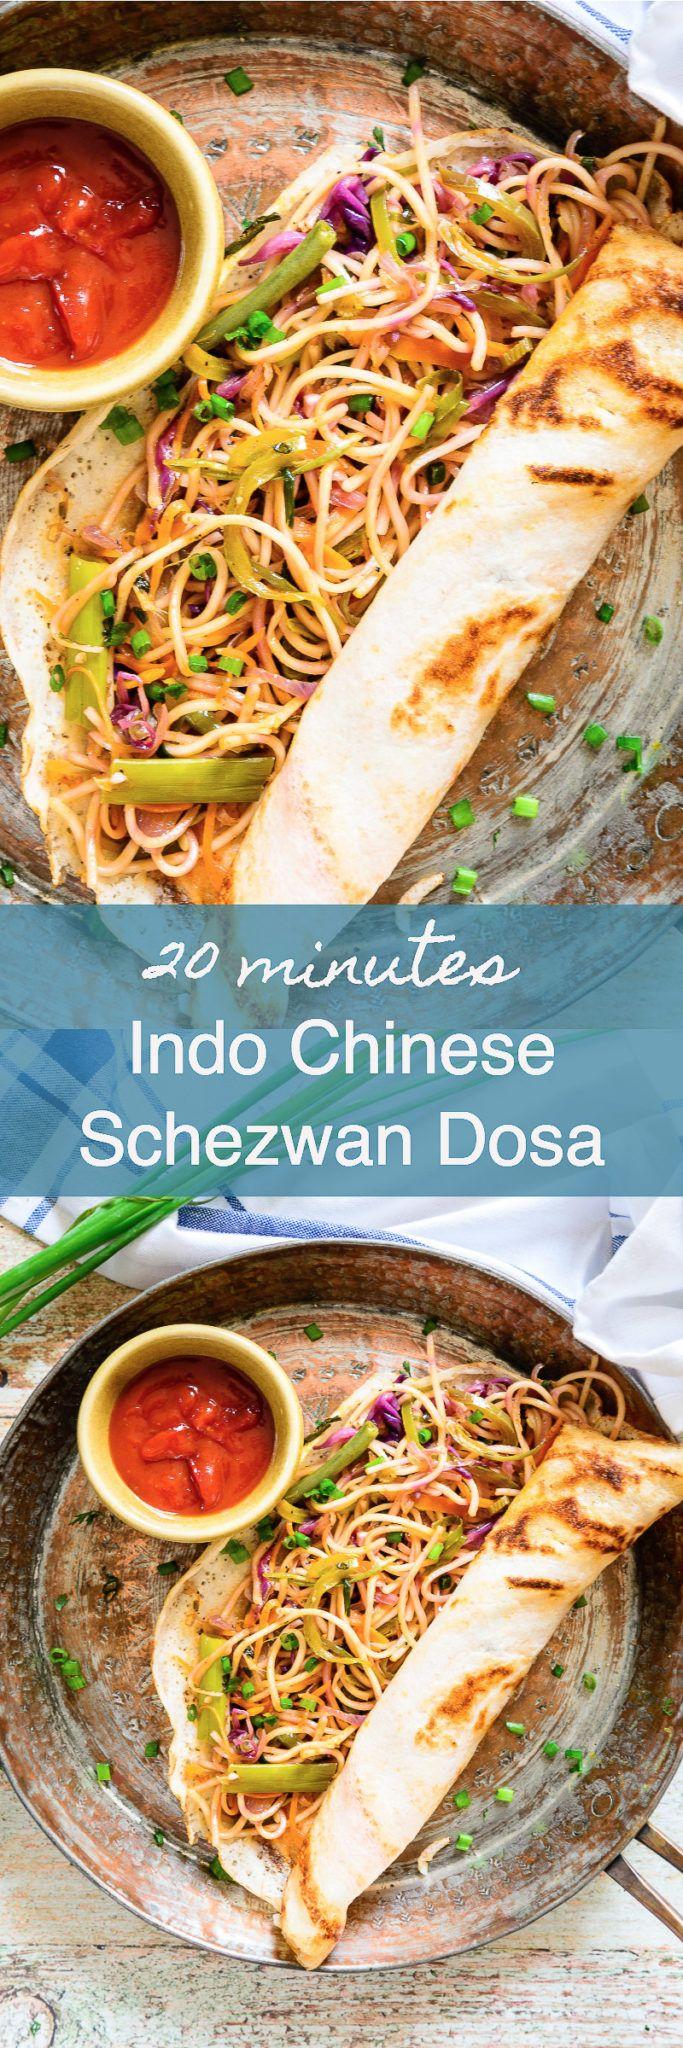 Indo Chinese Schezwan Dosa Recipe, How to make Chinese Dosa at Home ...